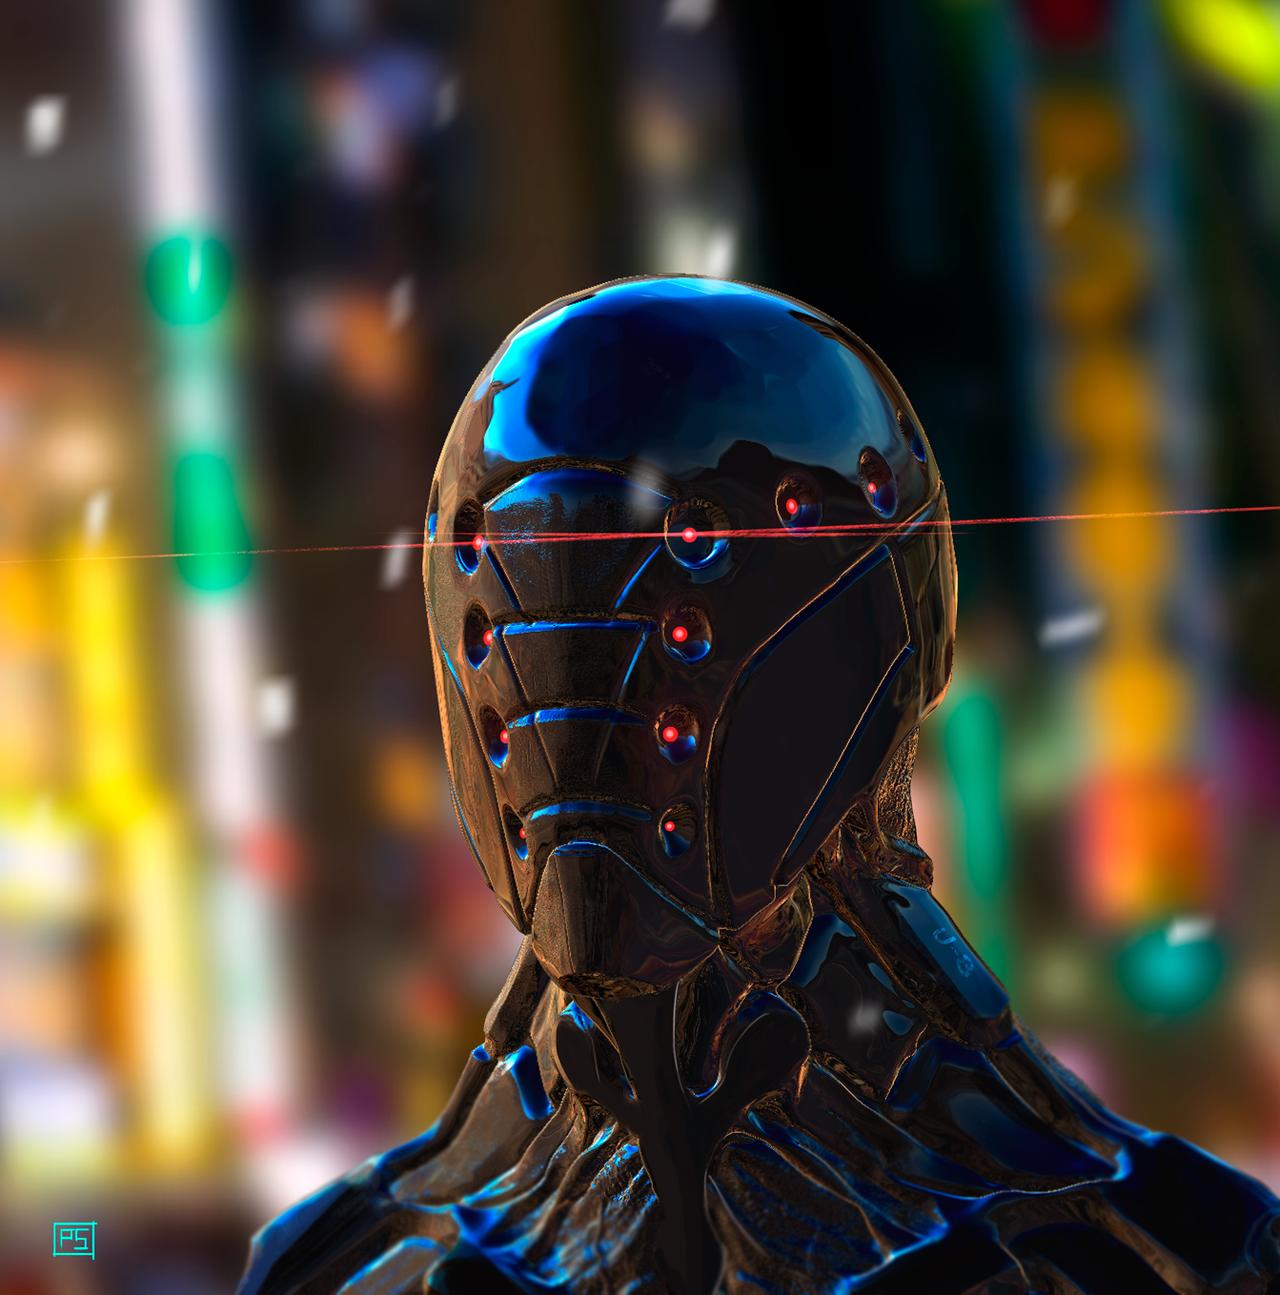 400 Wallpaper Biru Robot  Gratis